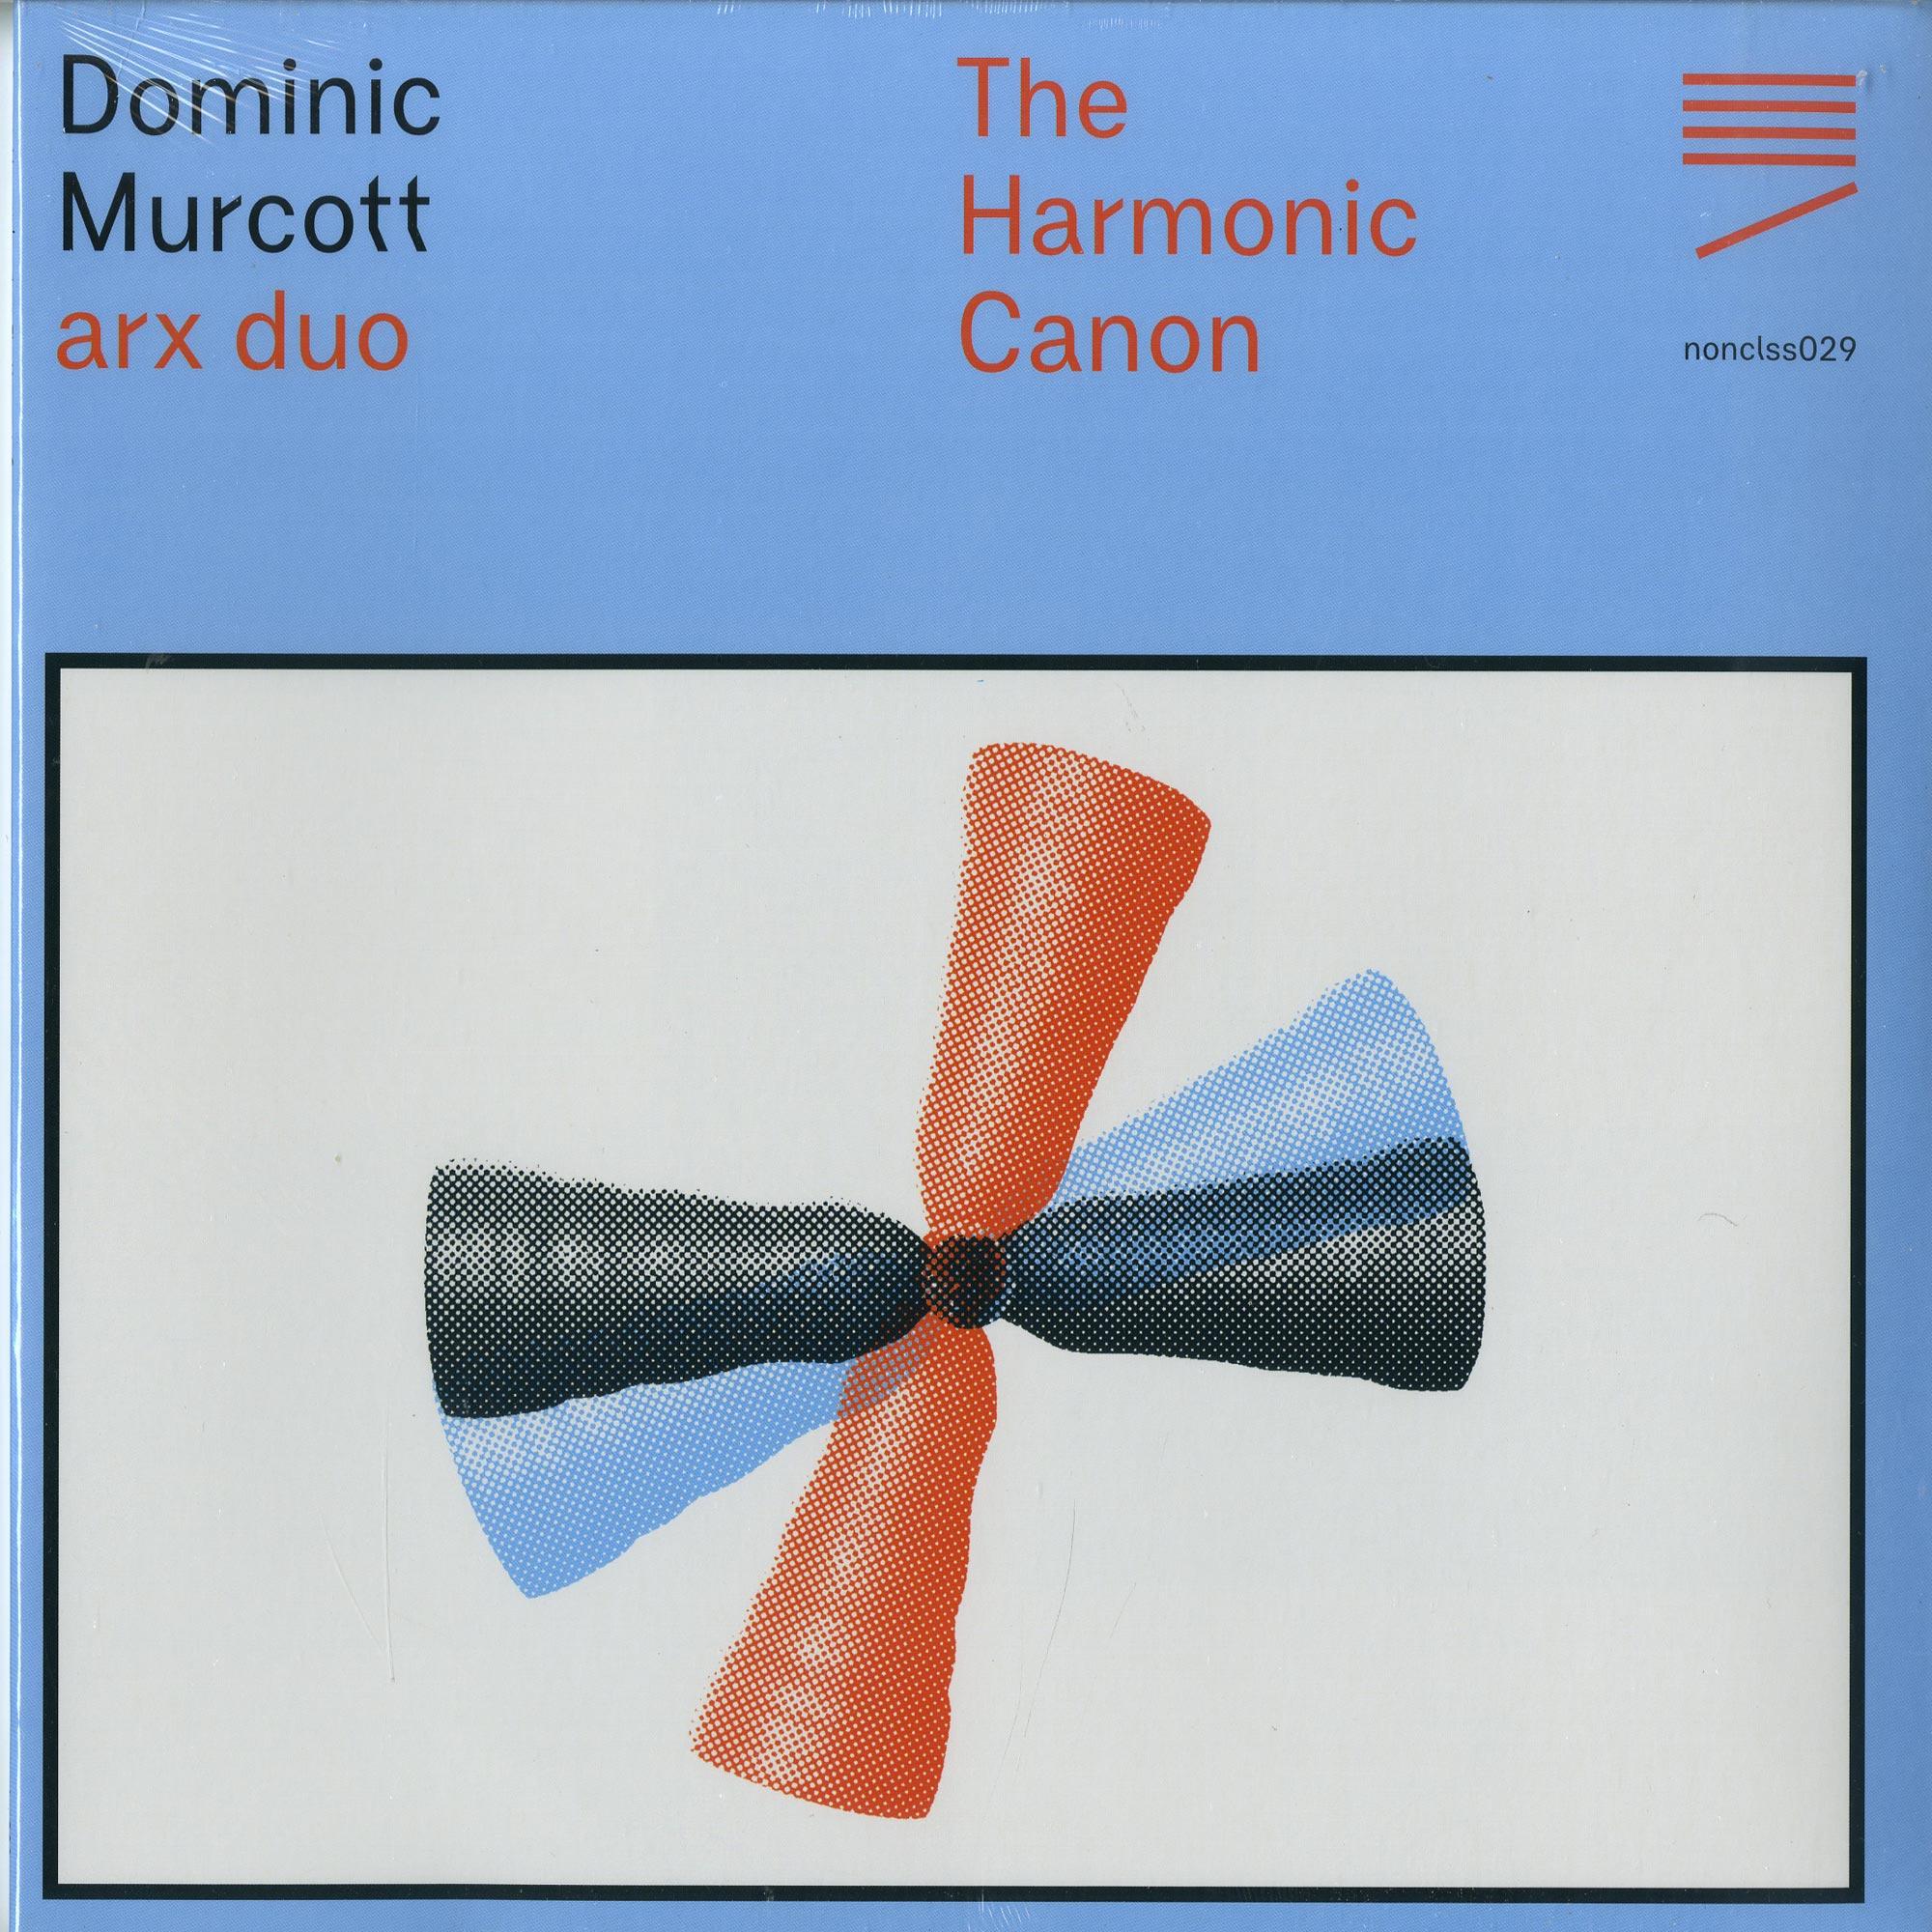 Dominic Murcott ft. Arx Duo - THE HARMONIC CANON